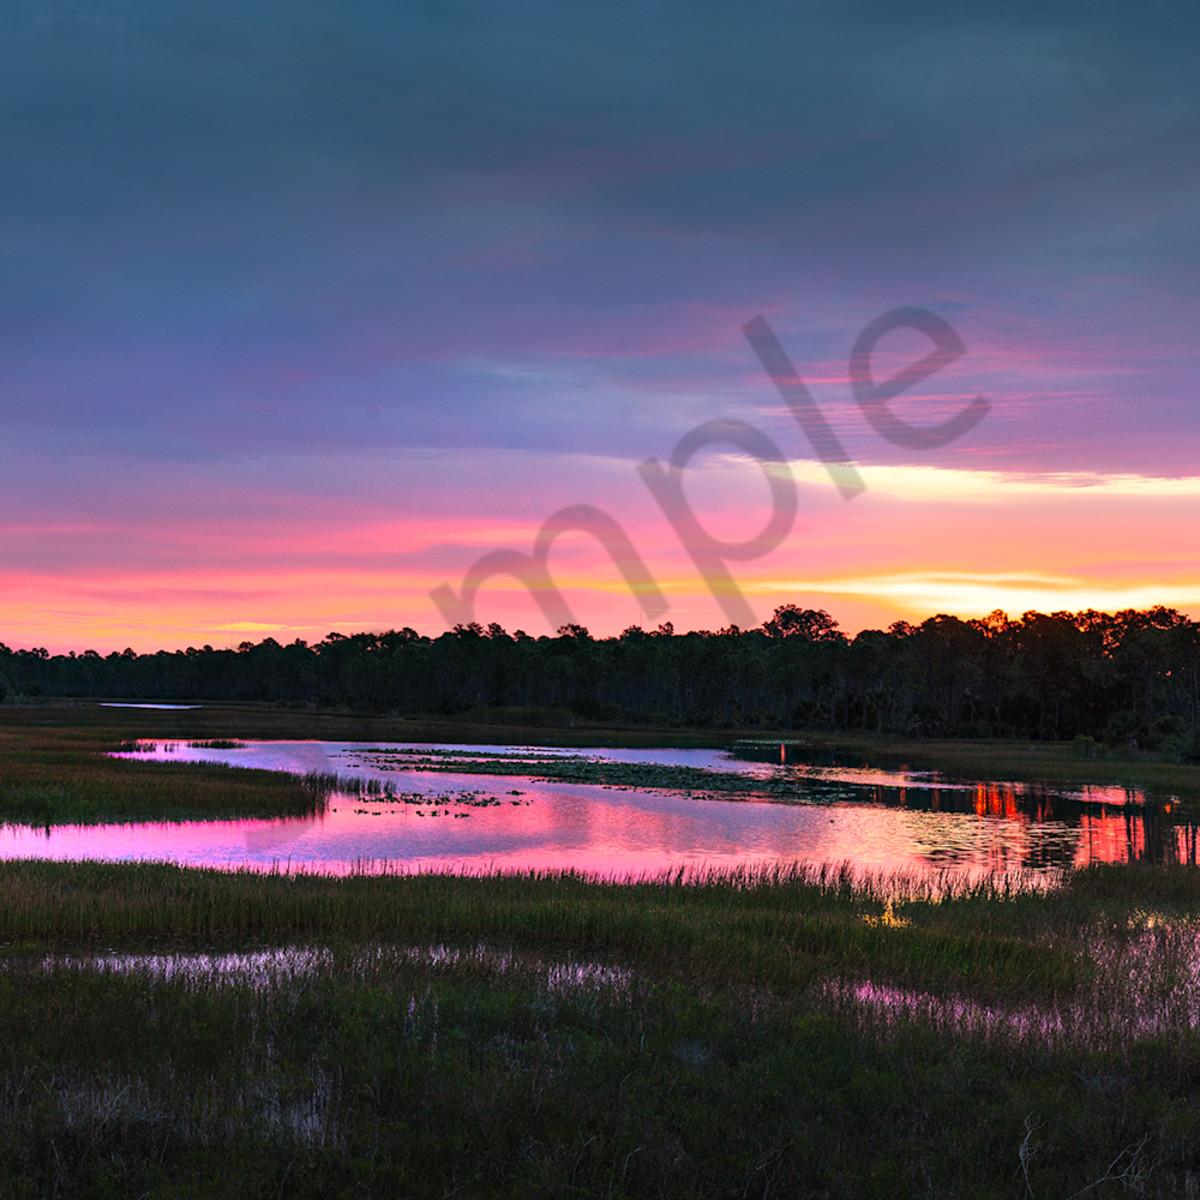 9854 5 6 7 sunrise babcock web 8x4 copy eg67u0